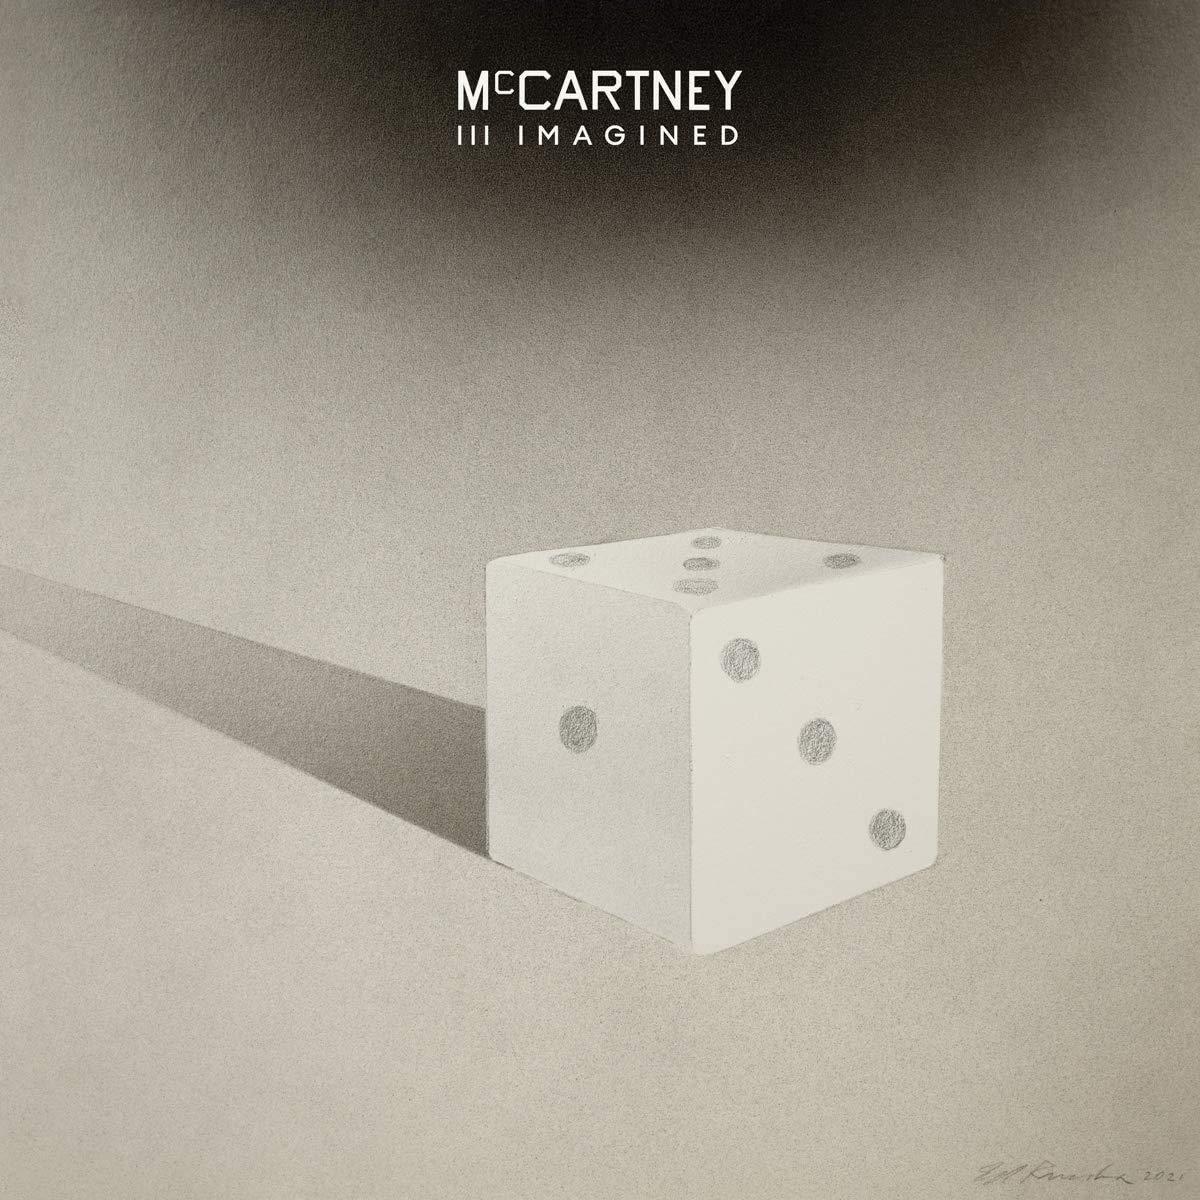 Book Cover: McCartney III Imagined